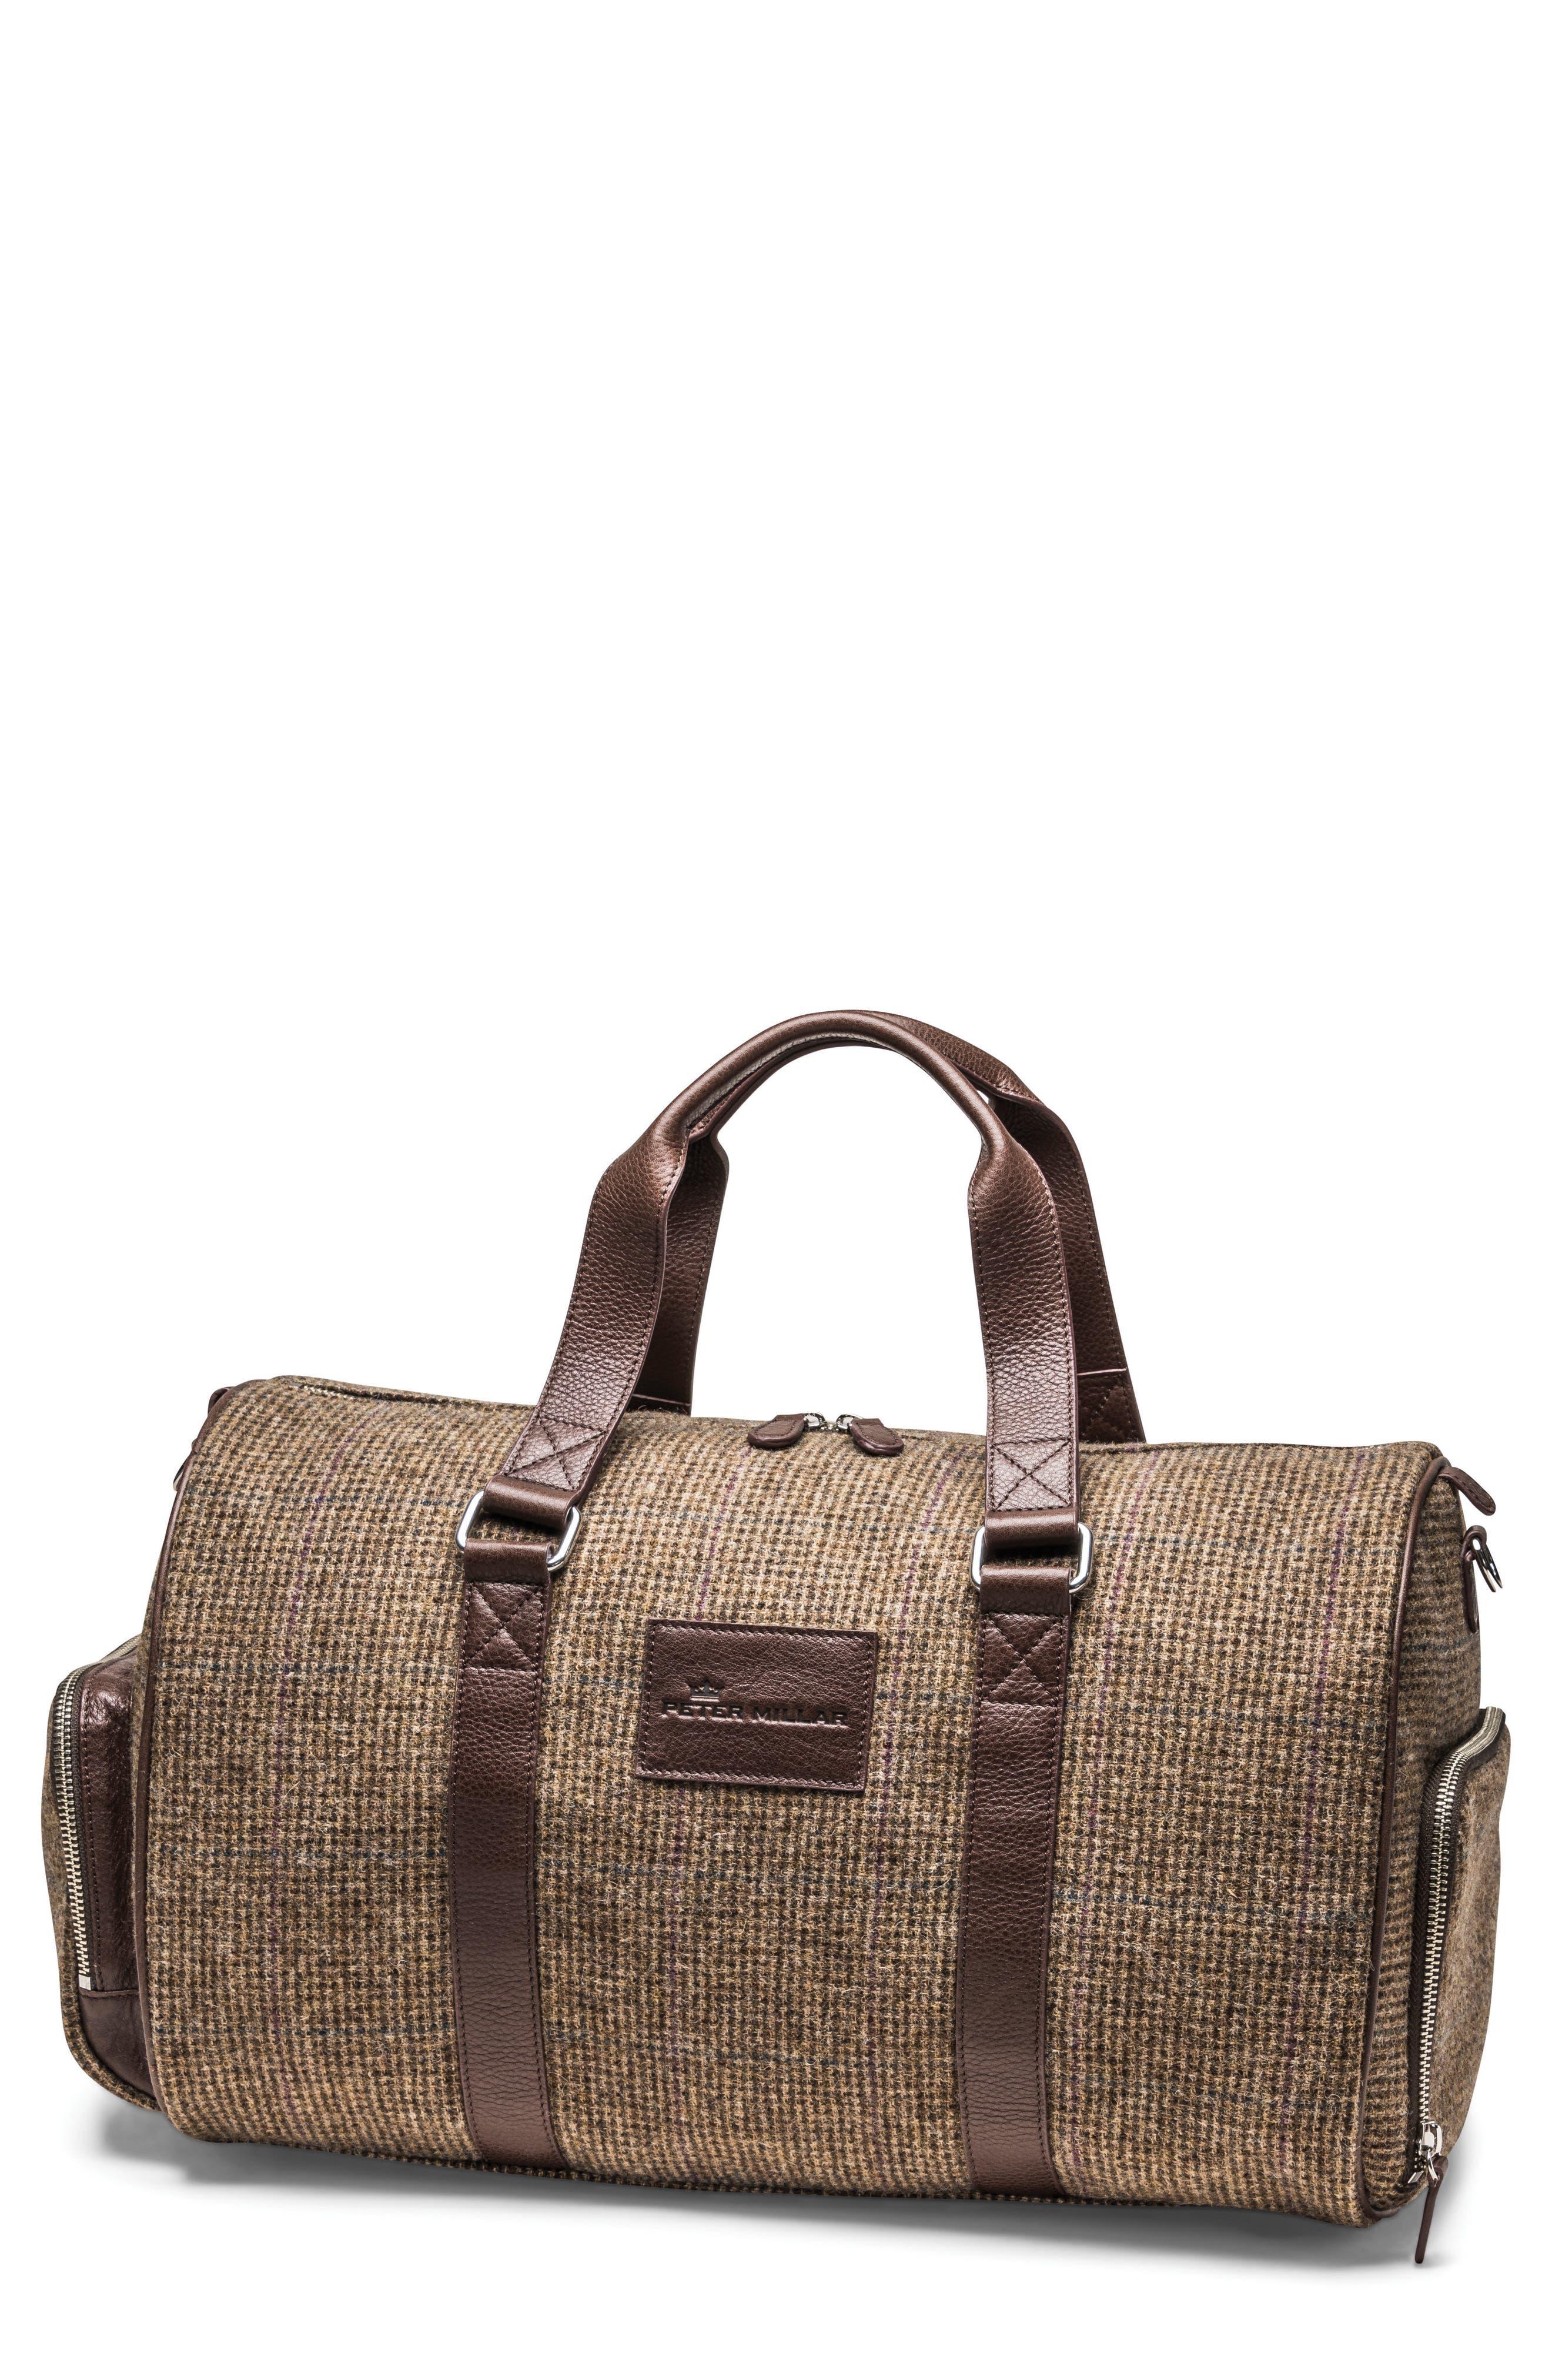 Alternate Image 1 Selected - Peter Millar Mountainside Day Duffel Bag